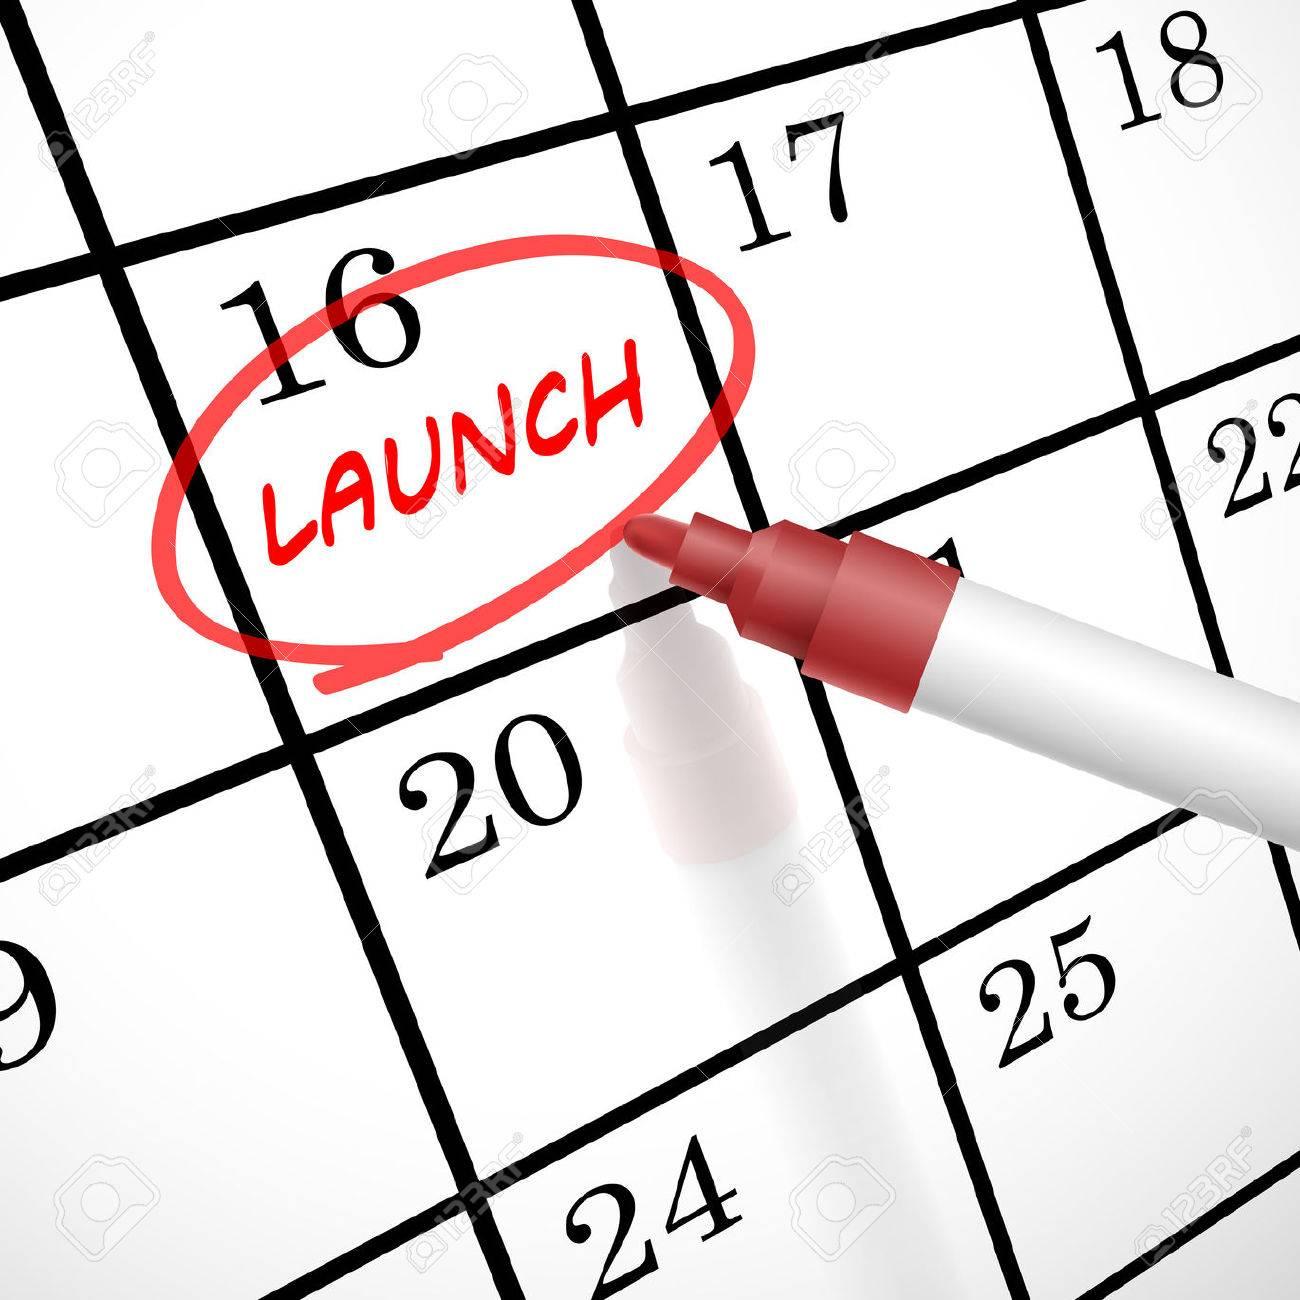 1300x1300 Launch Word Marked On A Calendar By A Red Pen Clip Art Libres De